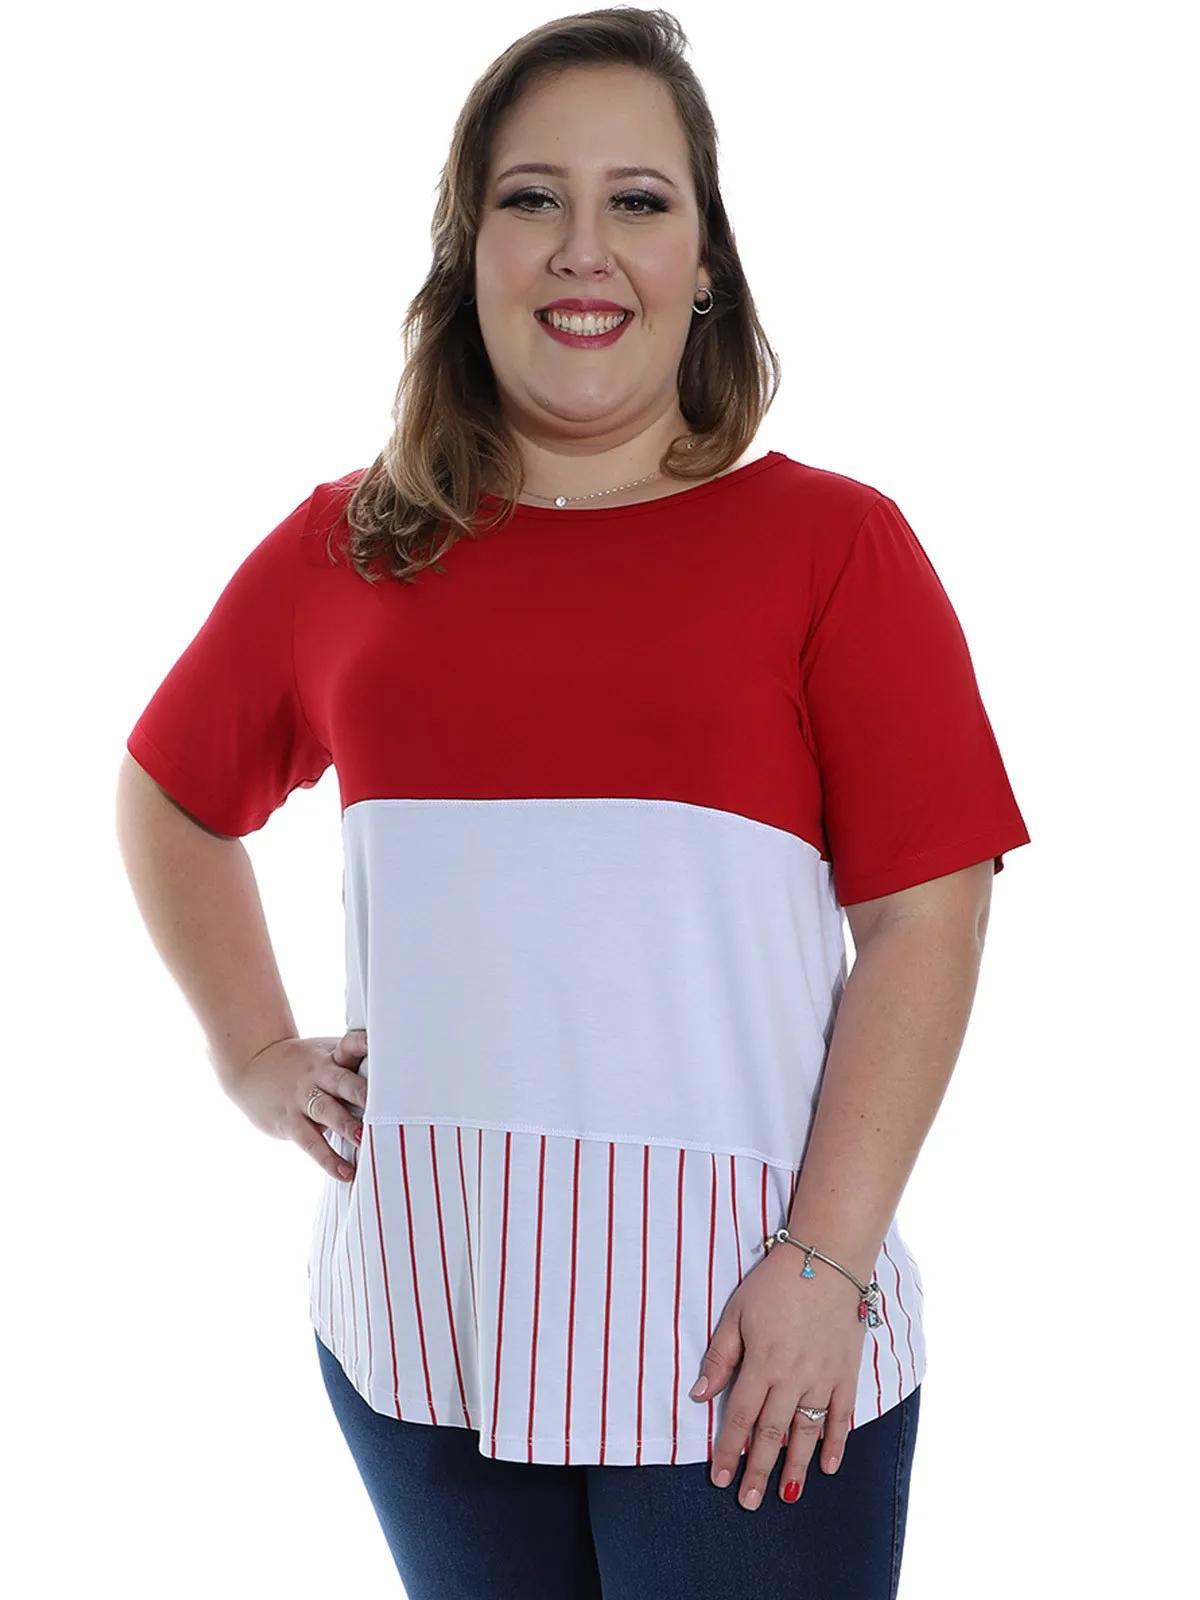 Blusa Plus Size Feminino Decote Semi-Canoa Longuete Vermelho